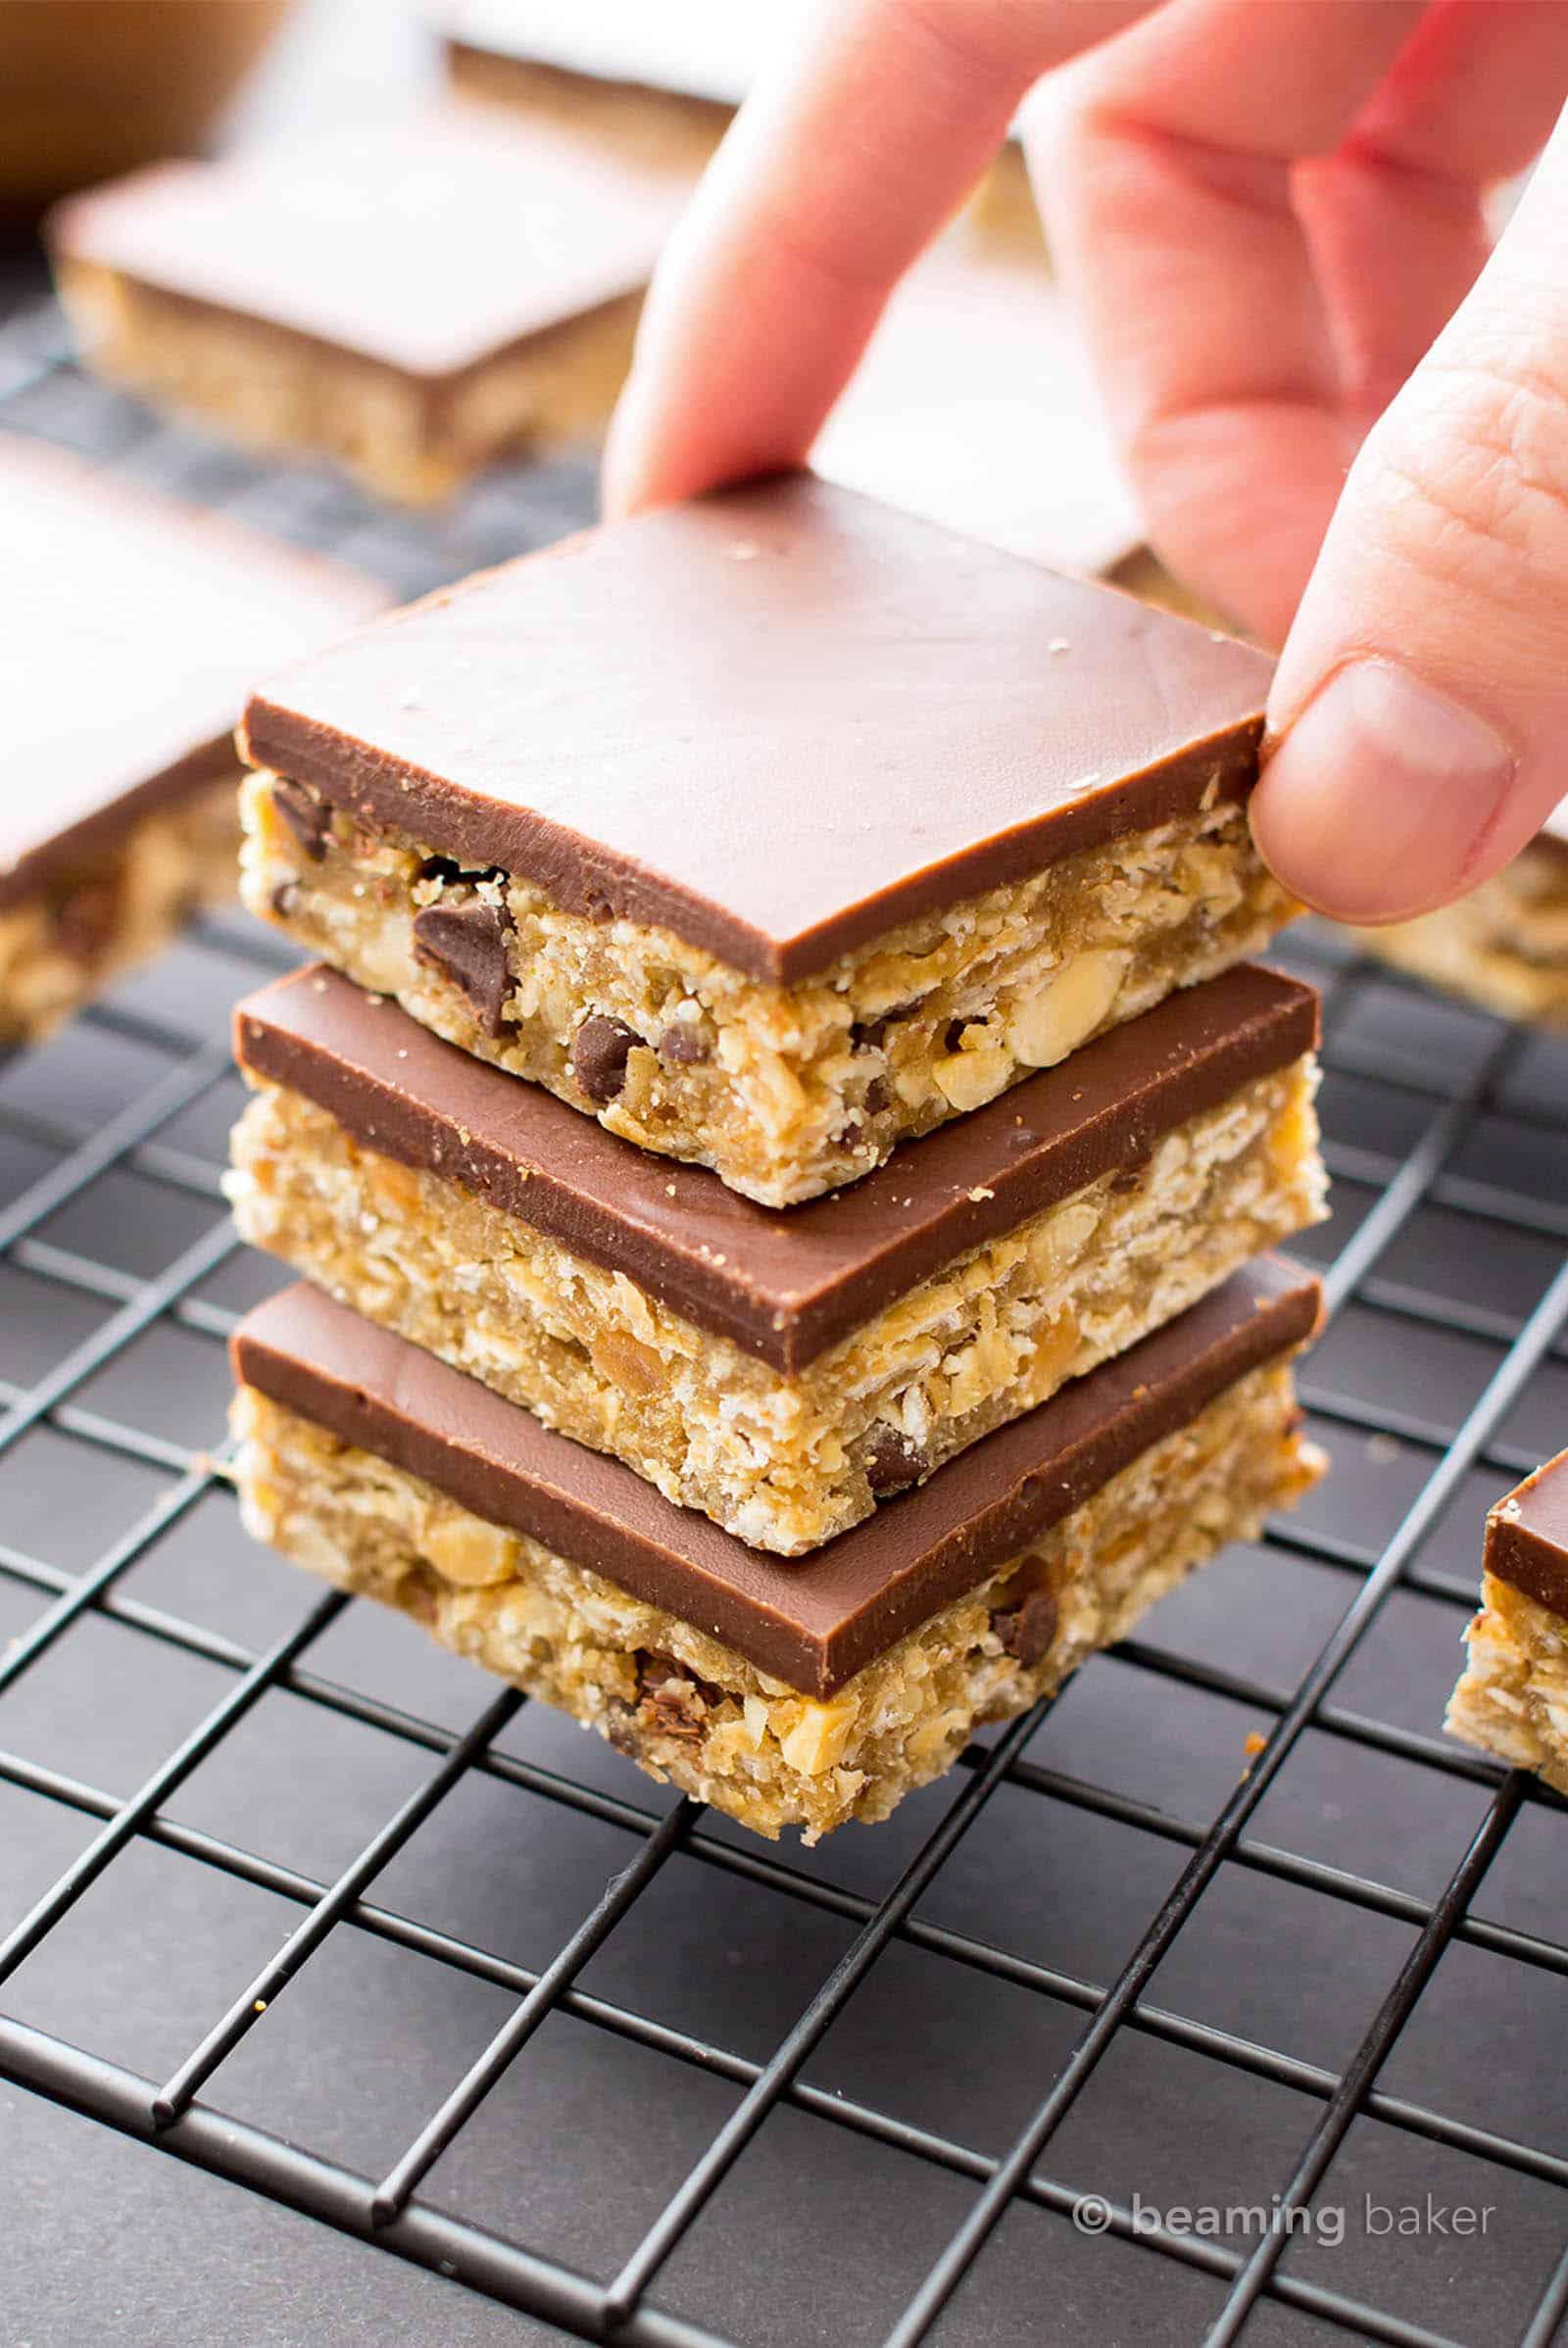 Chocolate Peanut Butter Oat Bars: the perfect mix of oatmeal cookie dough + chocolate peanut butter cups in 1 easy to make chocolate peanut butter oat bars recipe! #Chocolate #NoBake #PeanutButter #Oatmeal | Recipe at BeamingBaker.com